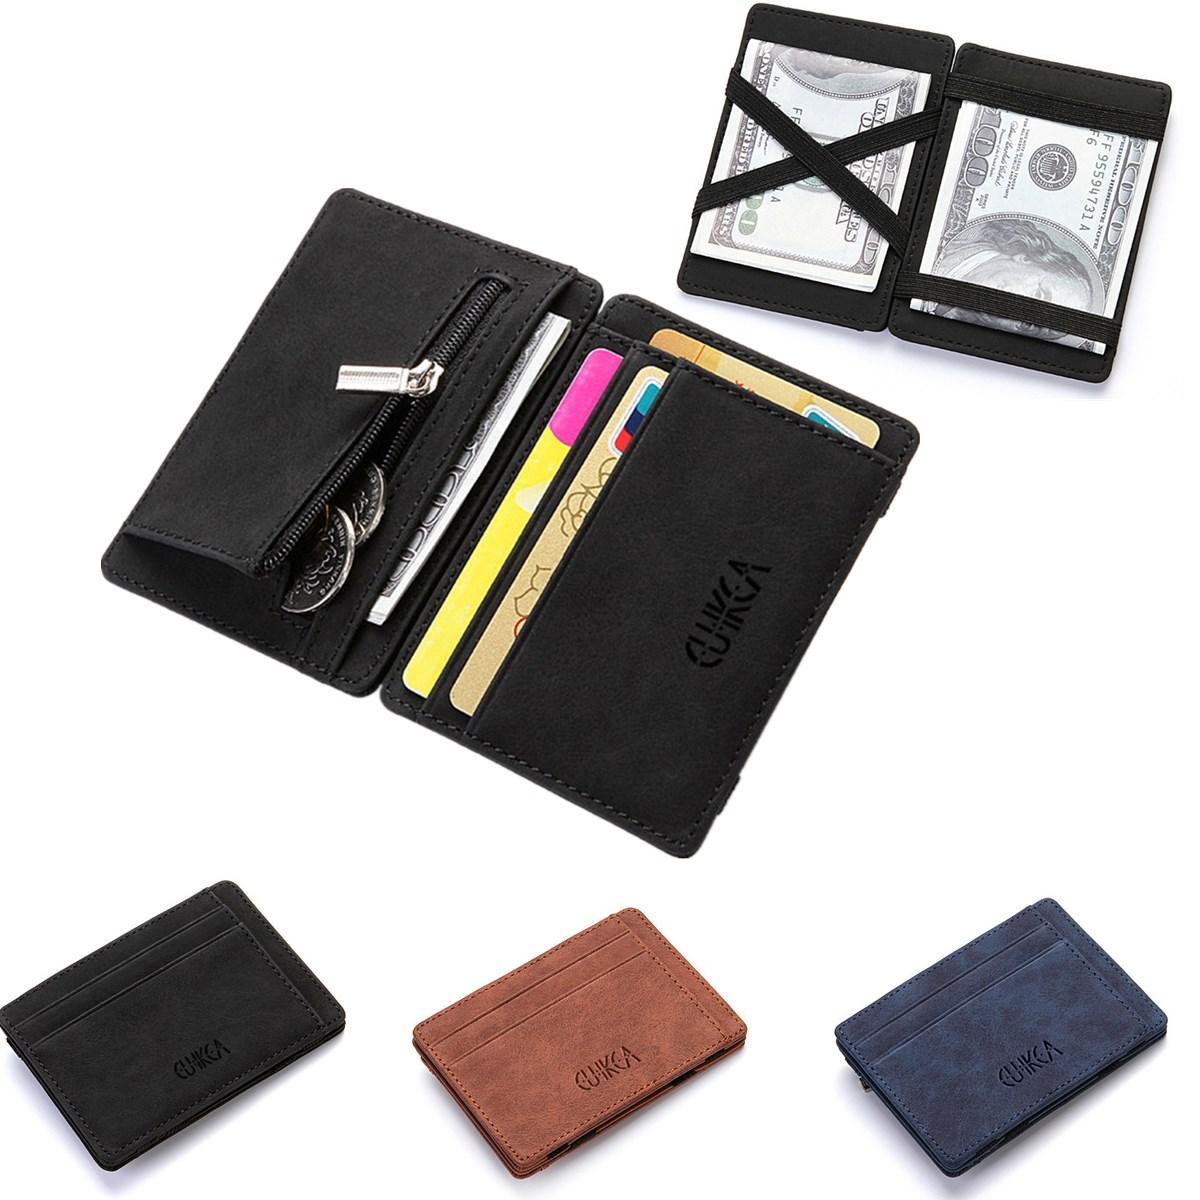 【Free Shipping + Flash Deal】Men Slim Billfold Wallet PU Leather Credit Card Holder